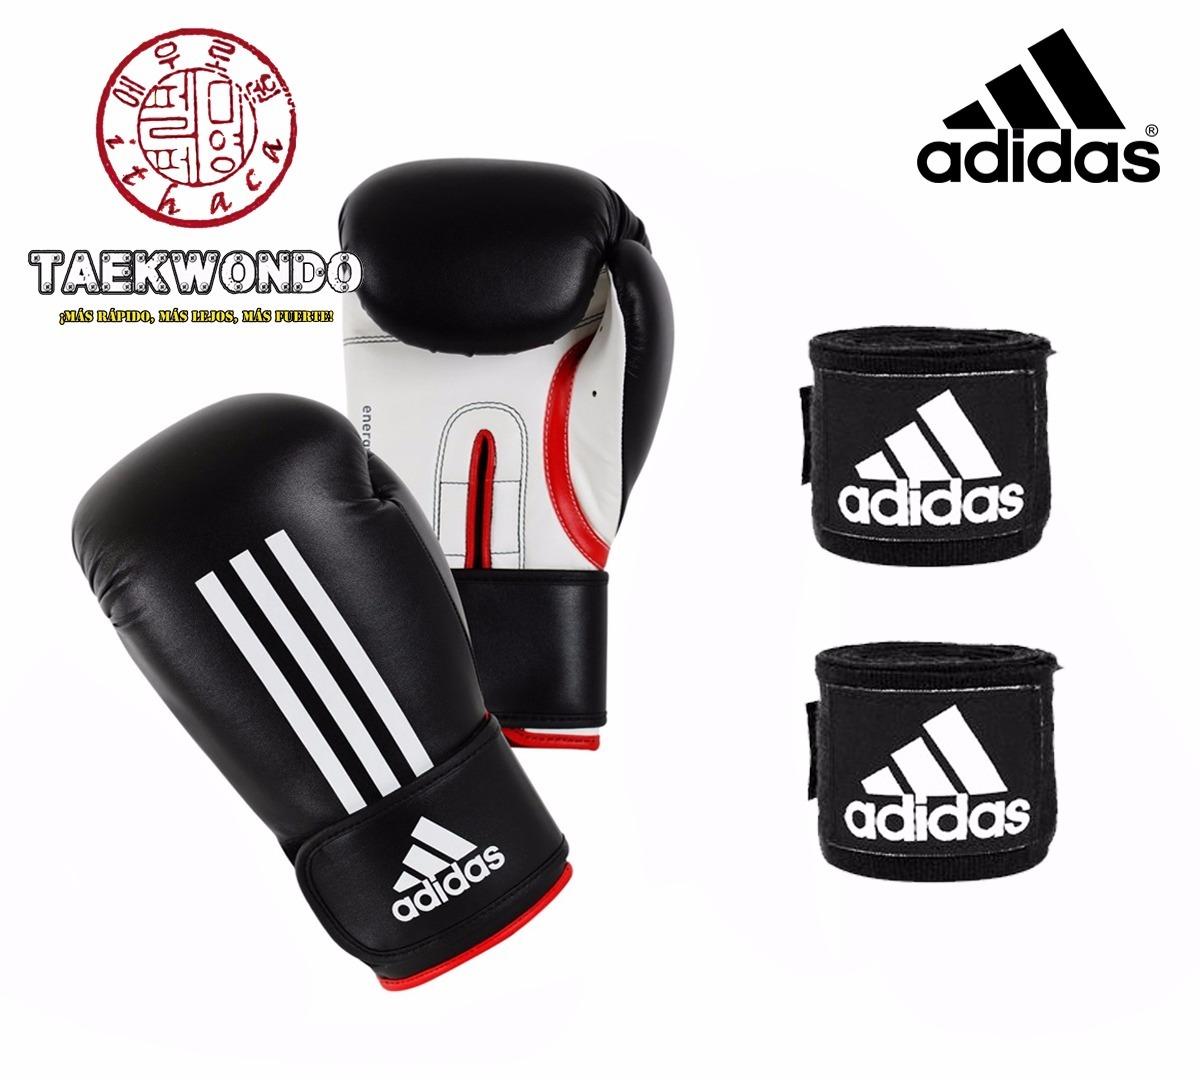 106ffd8962c paquetes box adidas - paquete  1 guantes - vendas ithaca box. Cargando zoom.